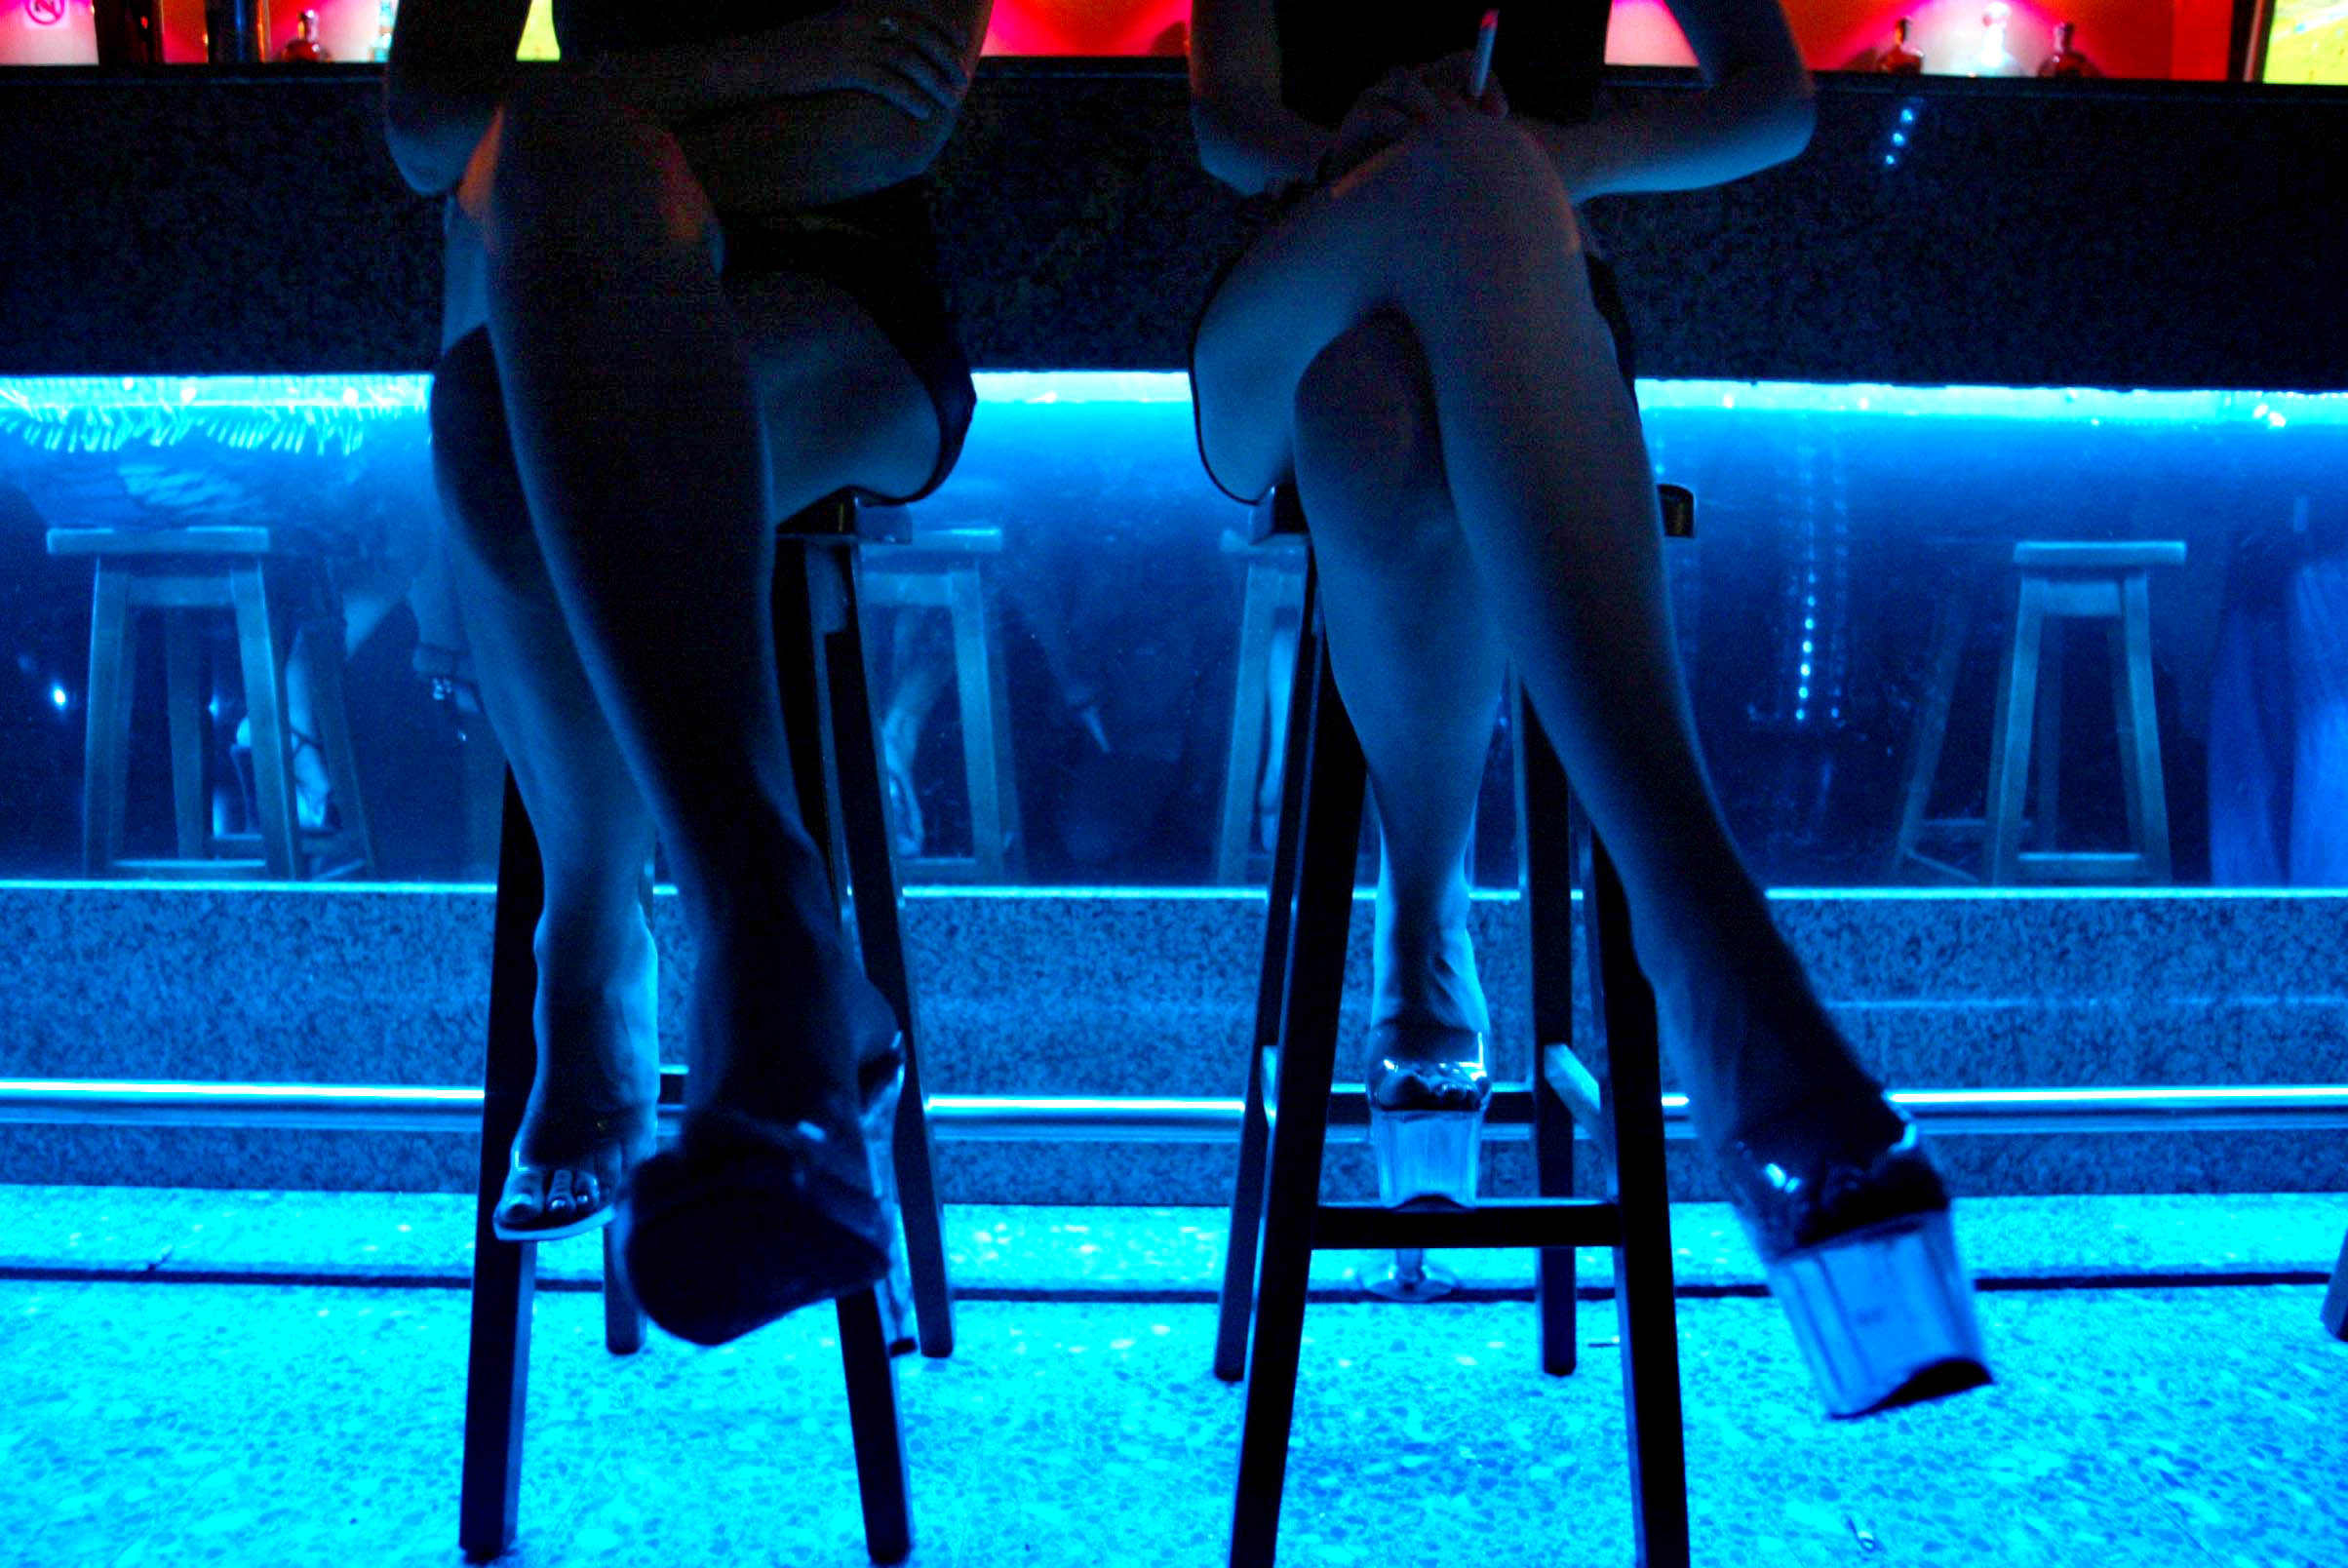 prostitutas en alcorcón prostituirse